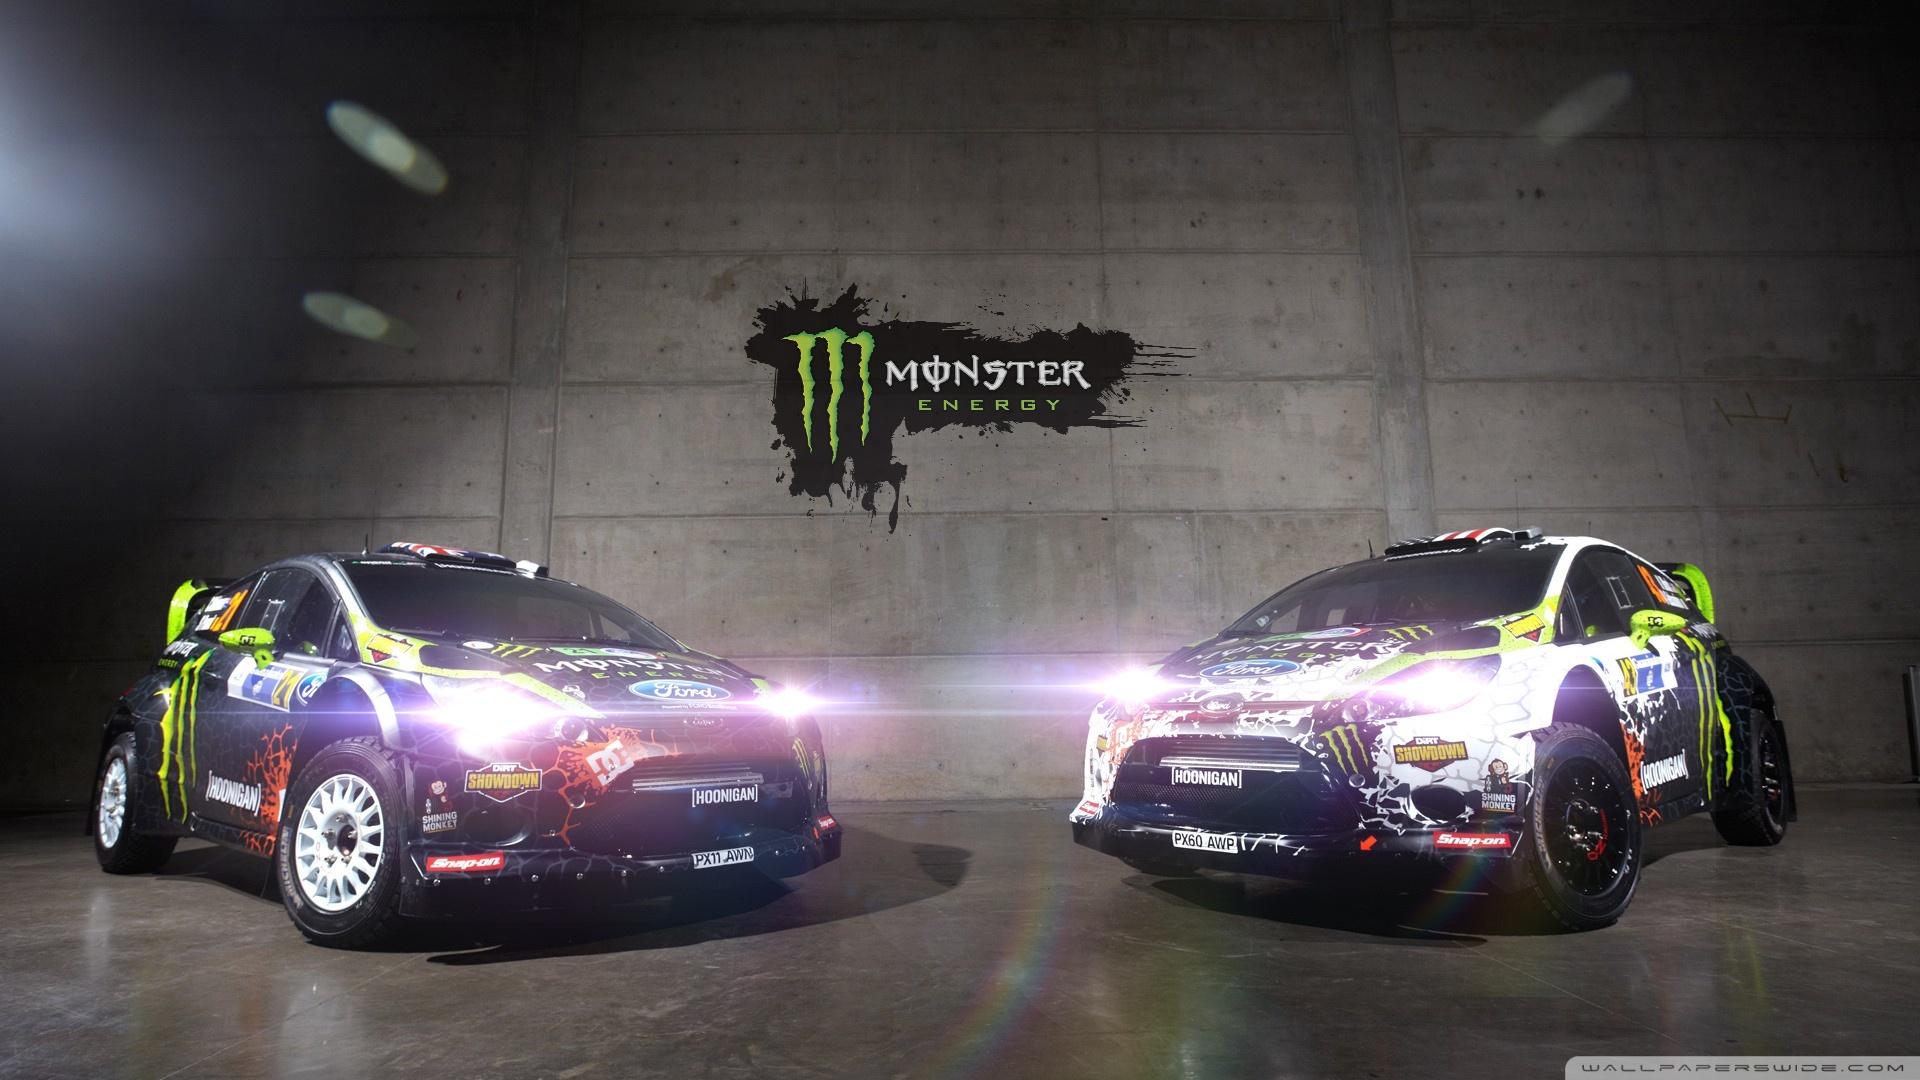 Car Stickers Wallpapers Ken Block Monster Energy Ford Fiesta Wrc 4k Hd Desktop